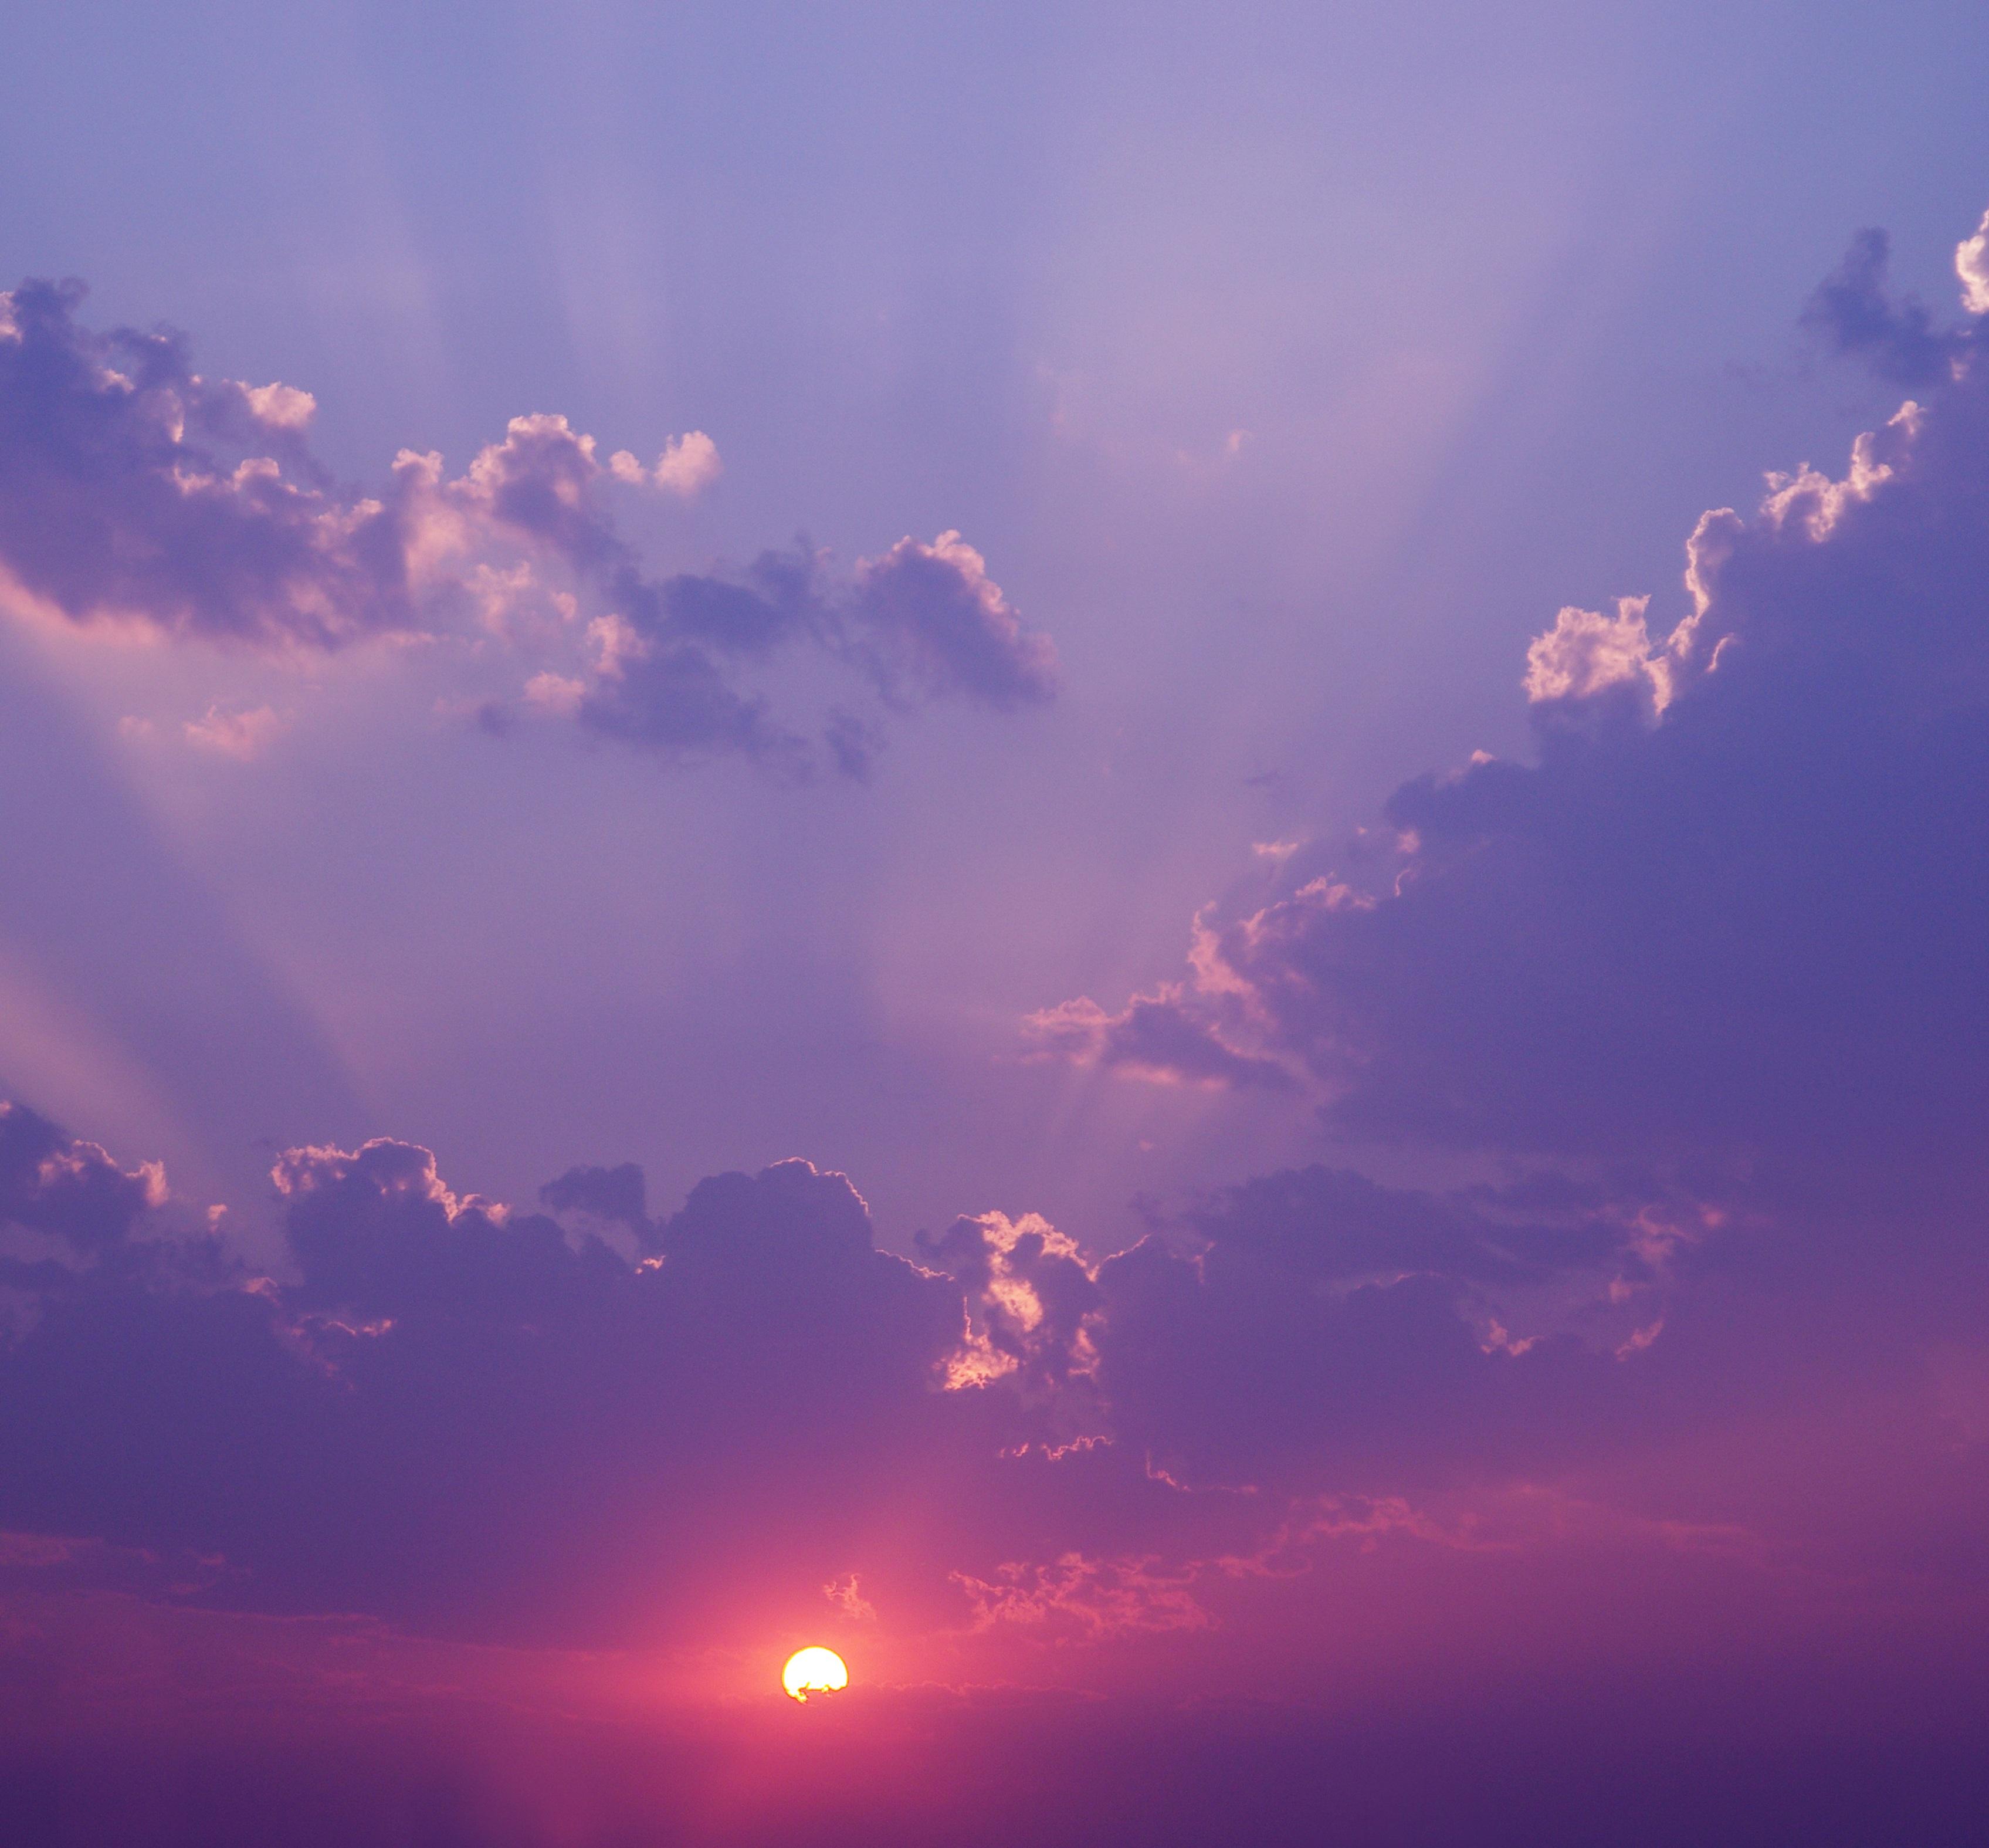 утро небо картинки проем при